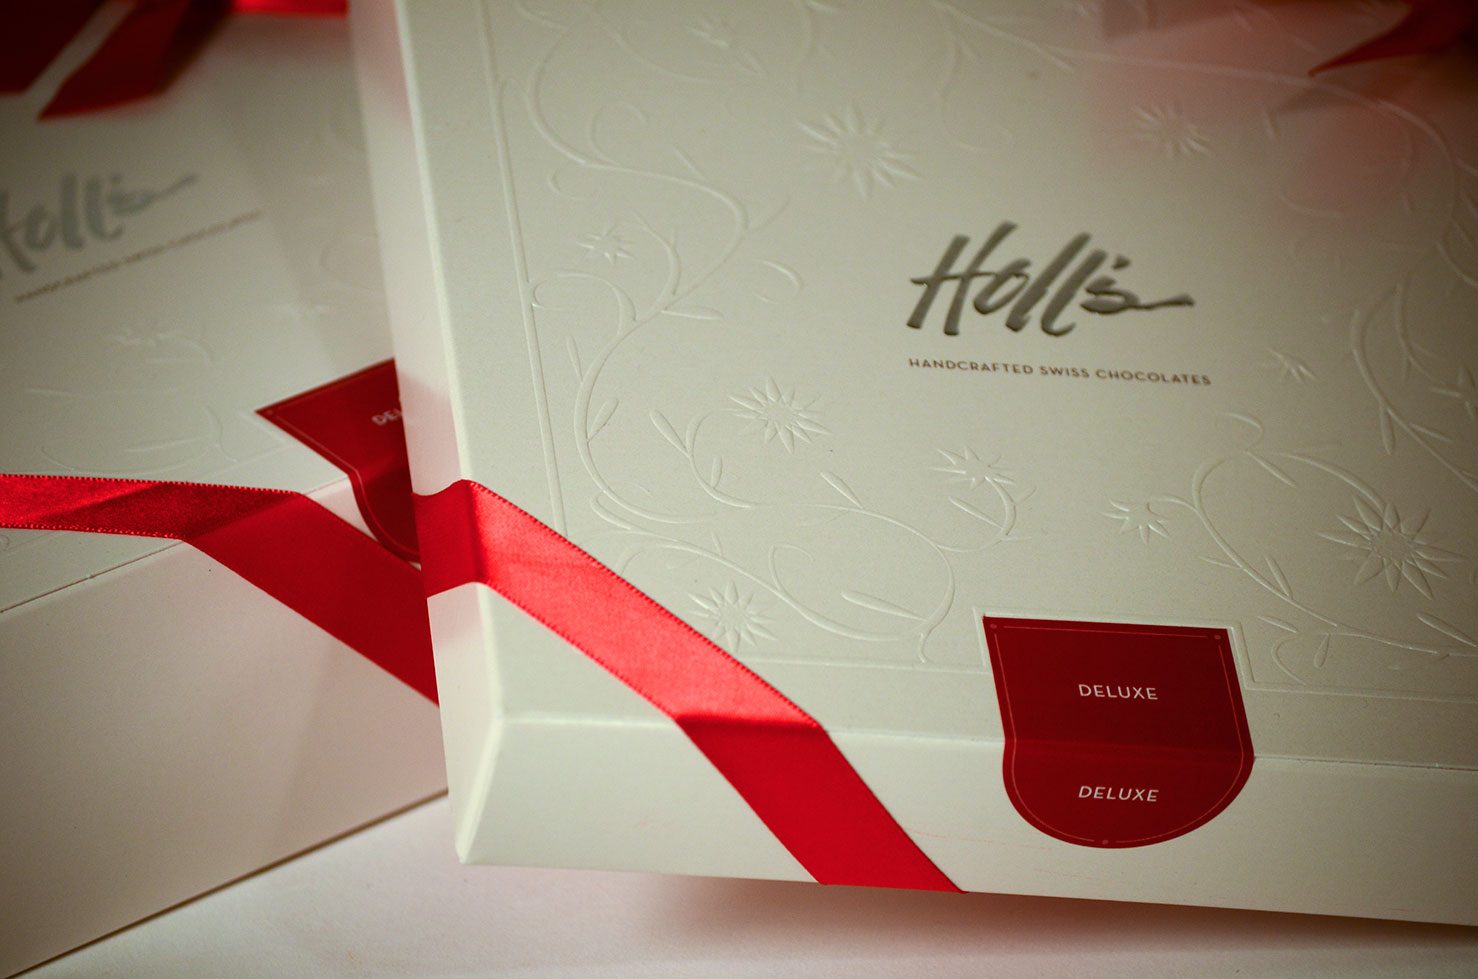 HollsChocolates10.jpg